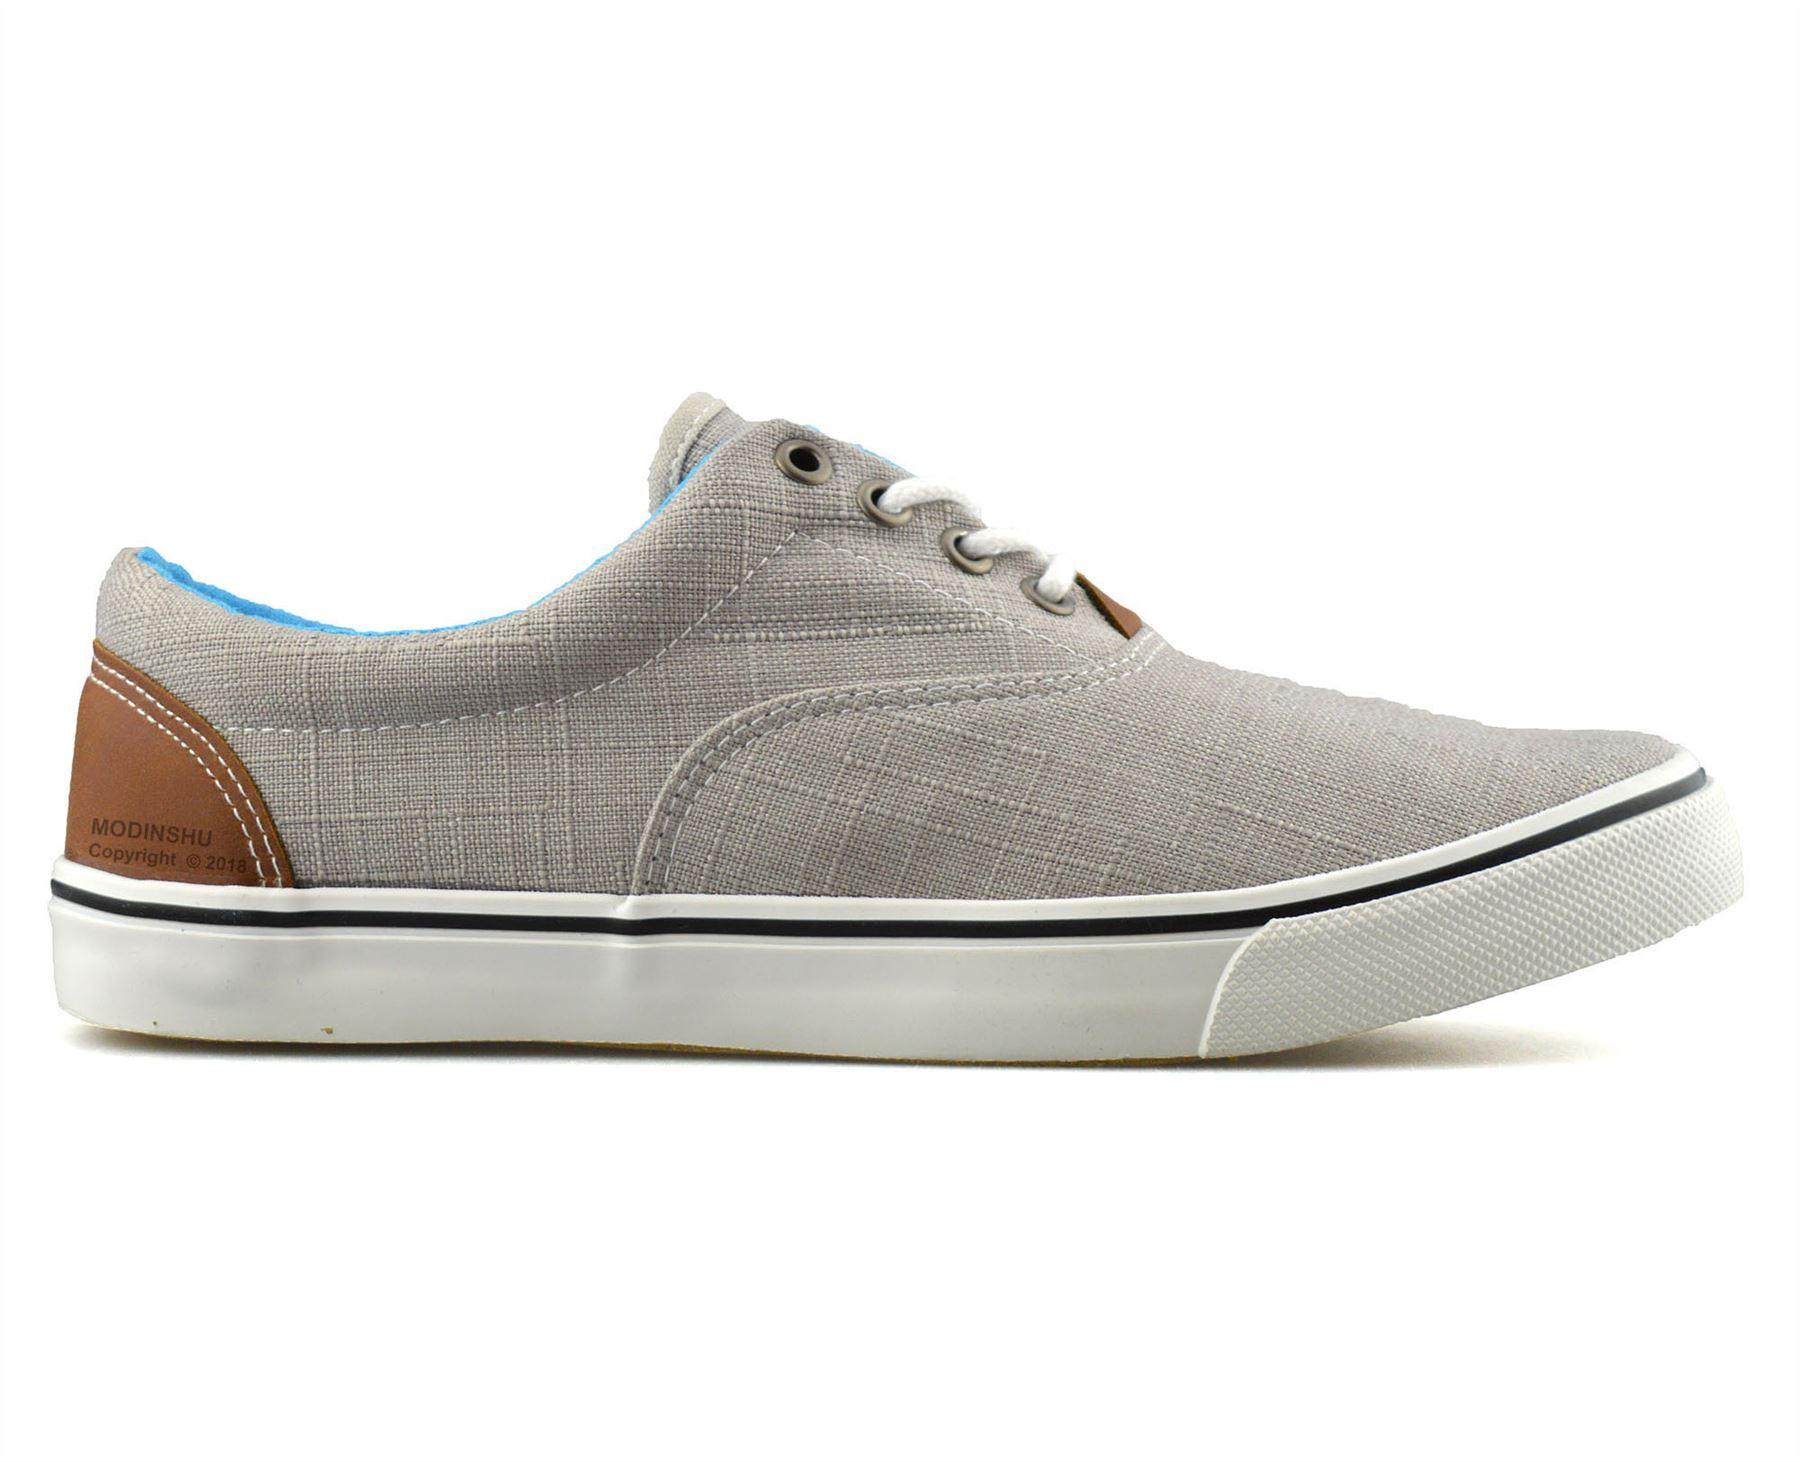 Mens-Casual-Flat-Lace-Up-Canvas-Skate-Pumps-Walking-Plimsolls-Trainers-Shoe-Size thumbnail 18